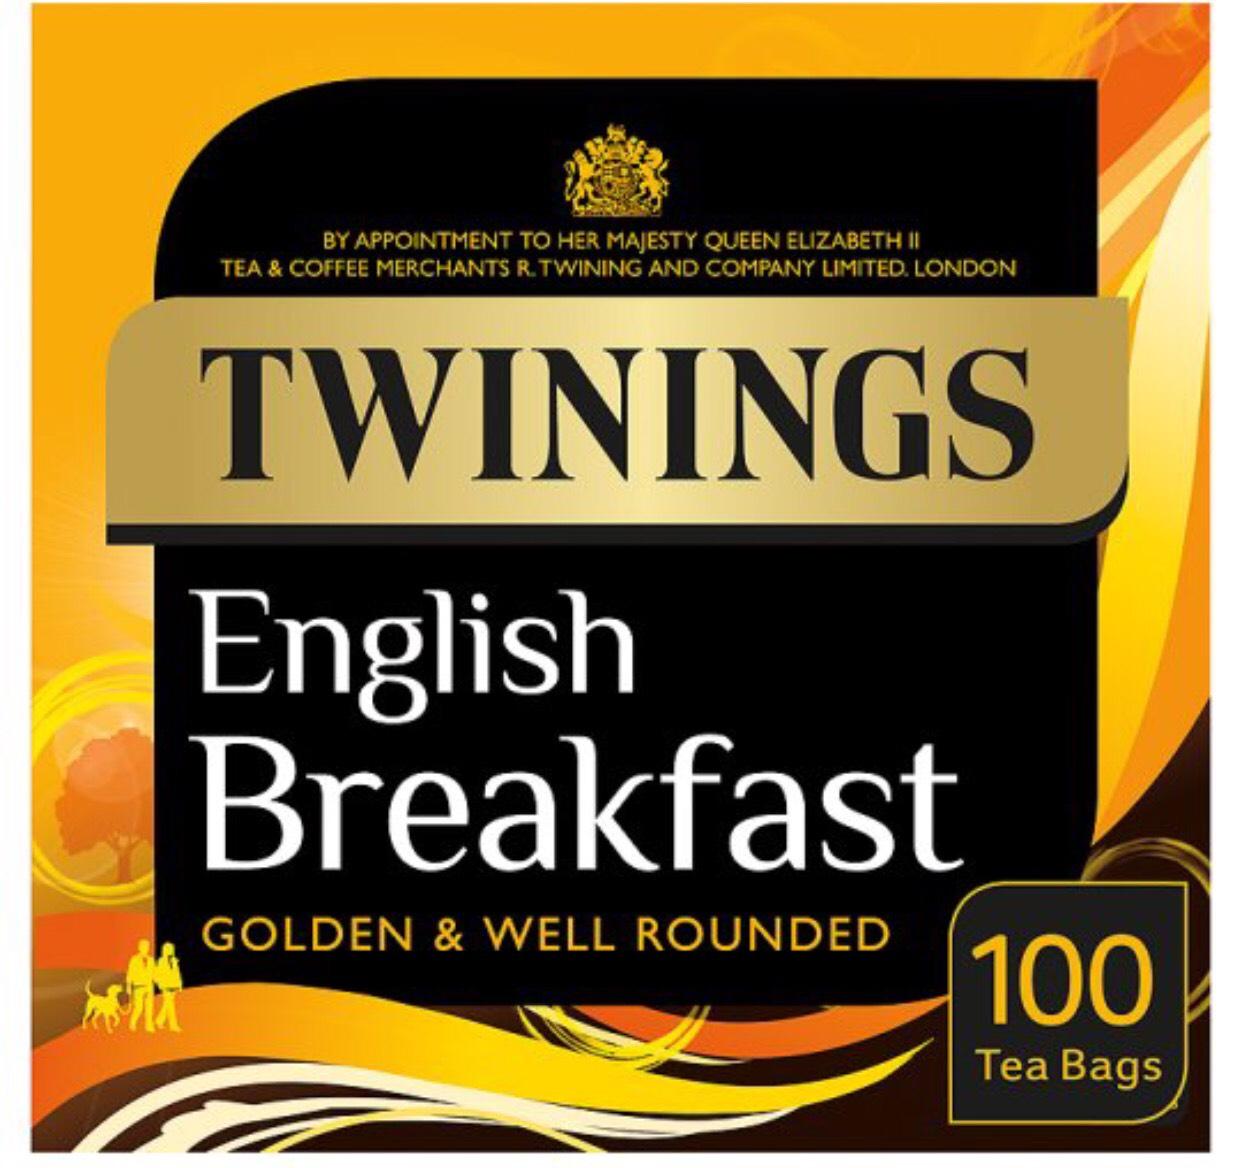 Twinings English breakfast 100 tea bags £2.50 @ Tesco